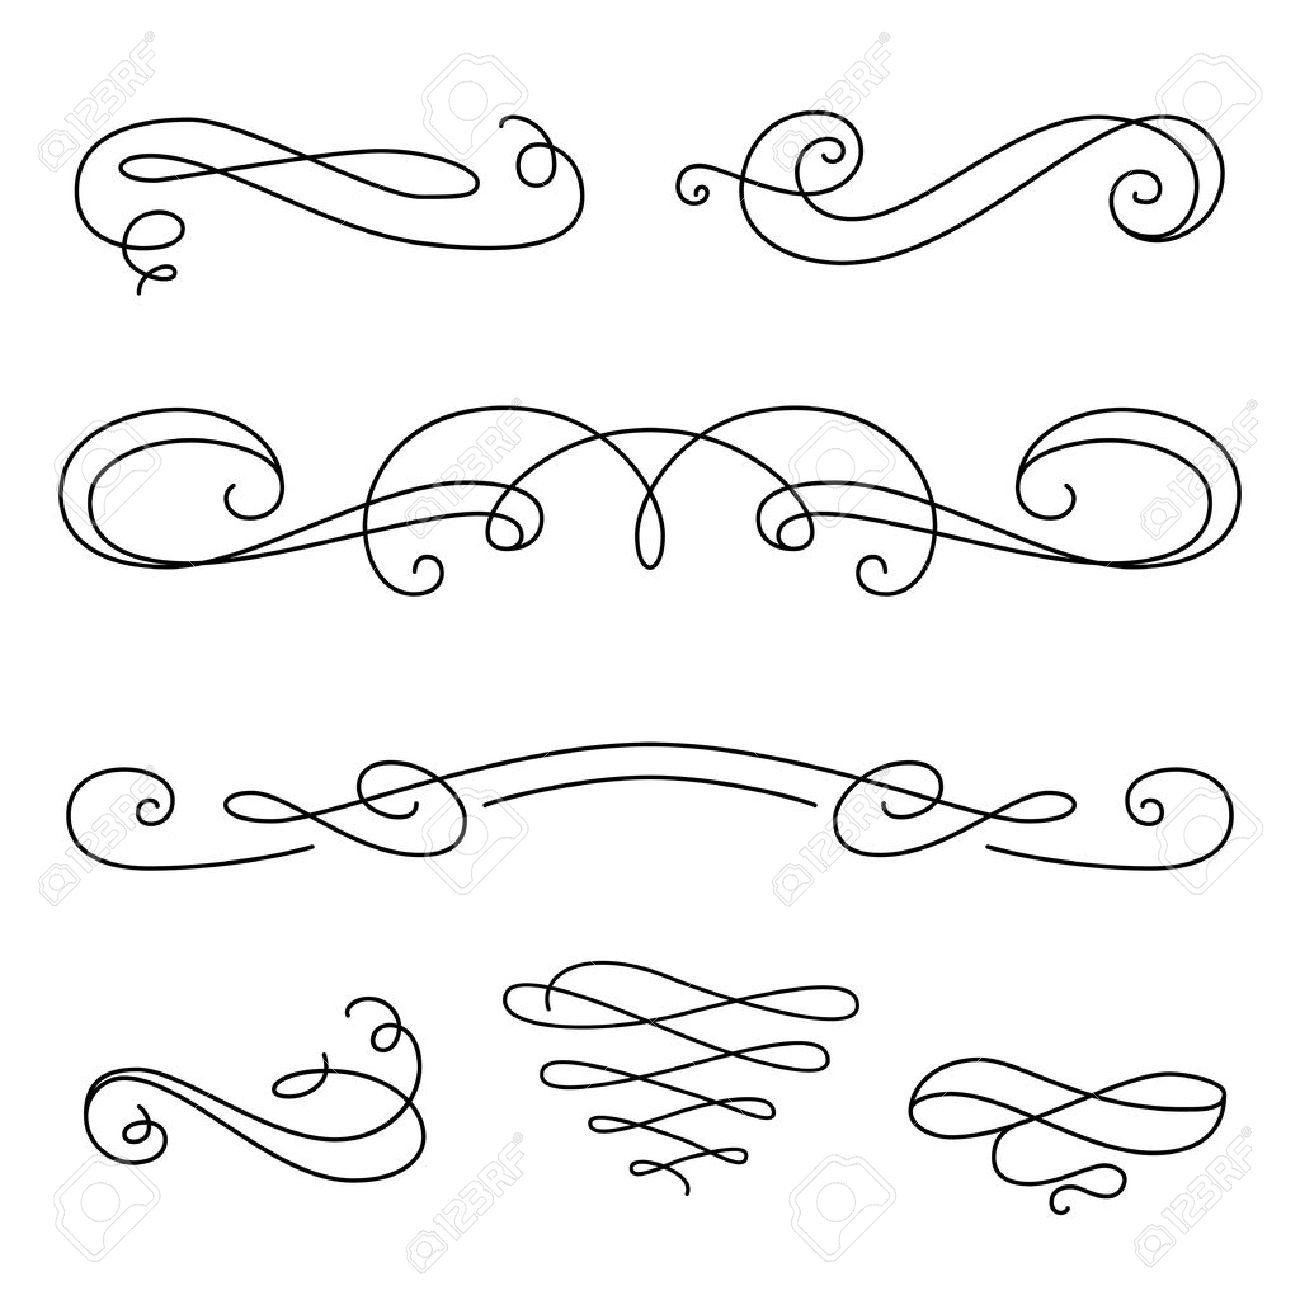 vintage vignettes page decoration template set of calligraphic